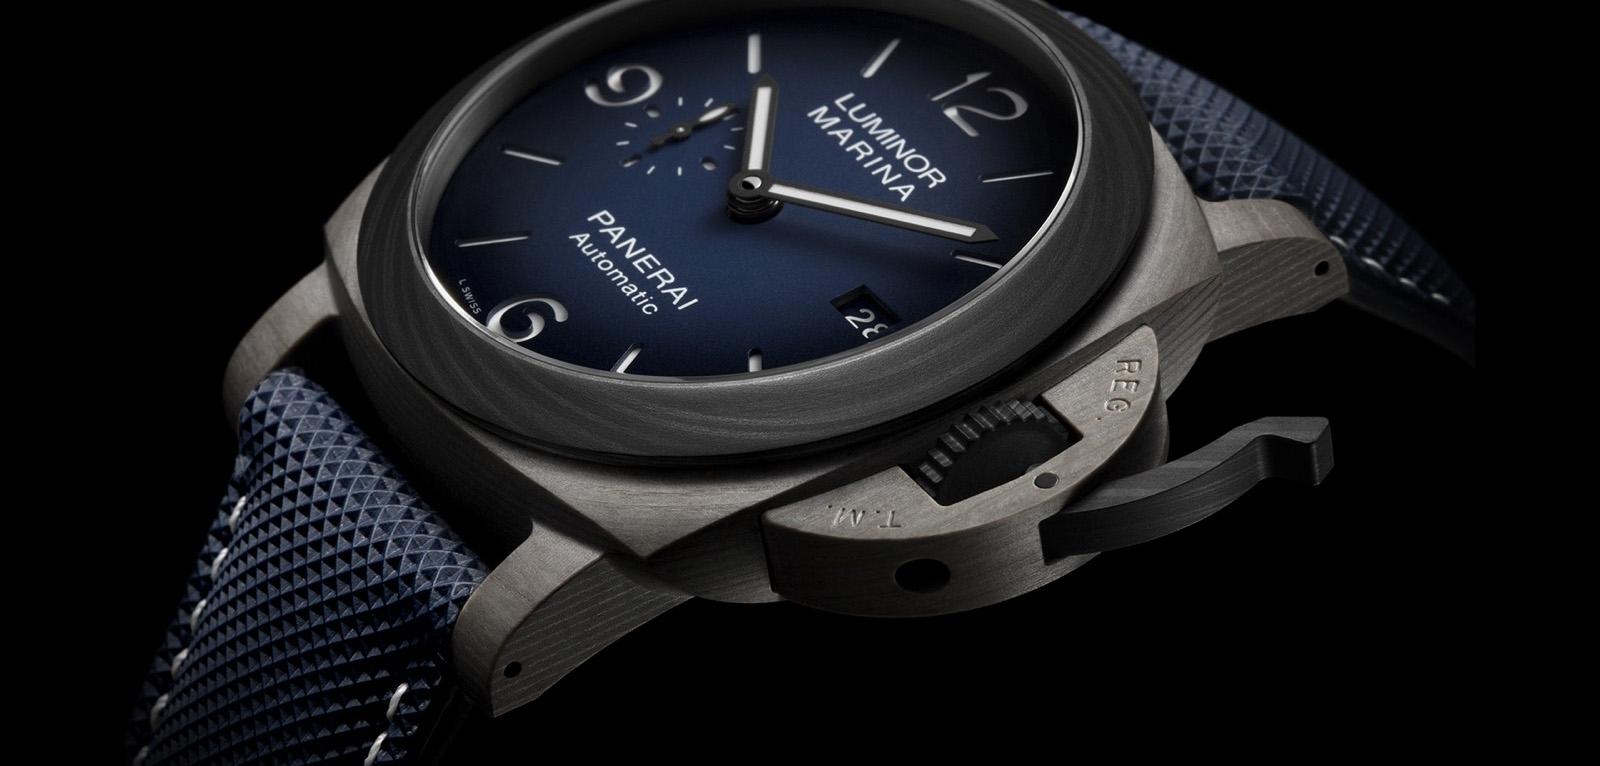 Panerai en Watches & Wonders Geneva 2020: Luminor y materiales high tech